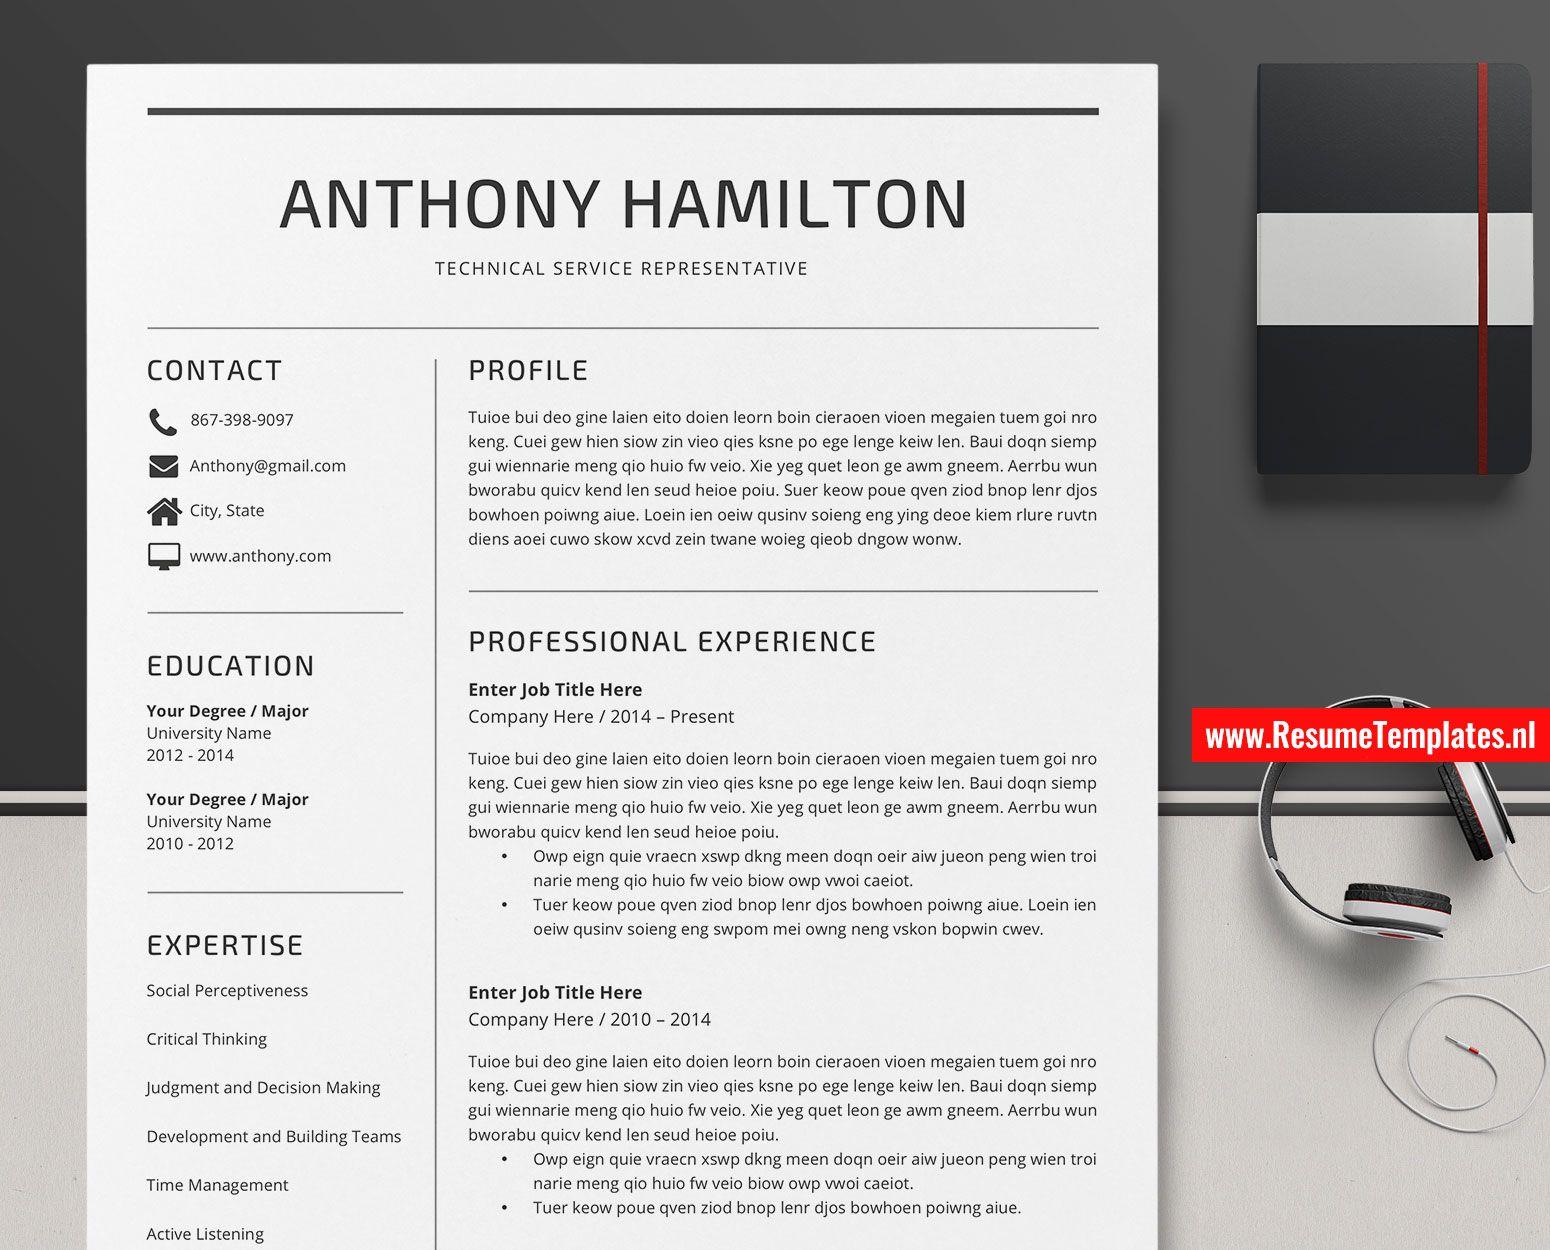 010 Top Word Resume Template Mac Image  2008 Microsoft 2011Full